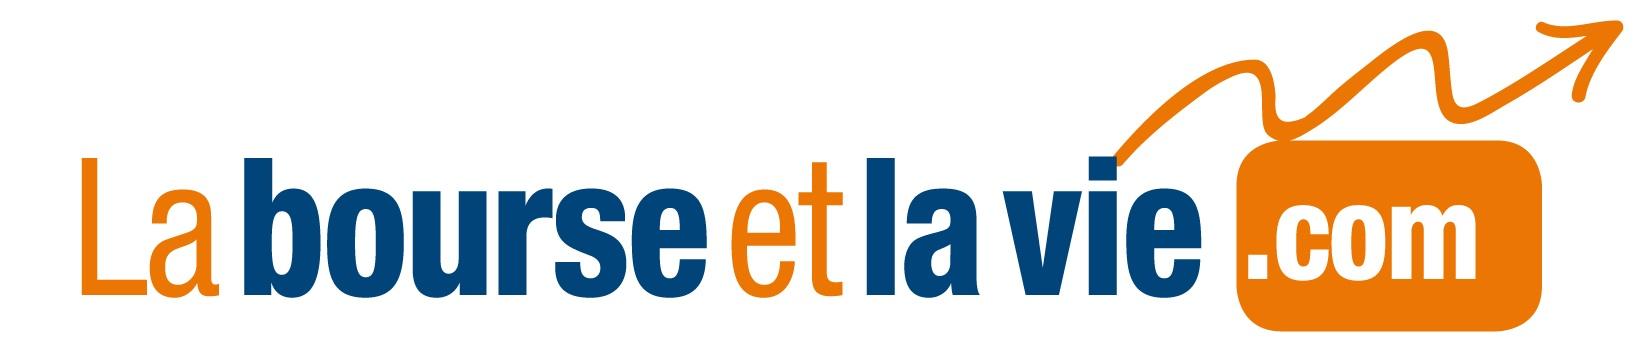 logo labourseetlavie